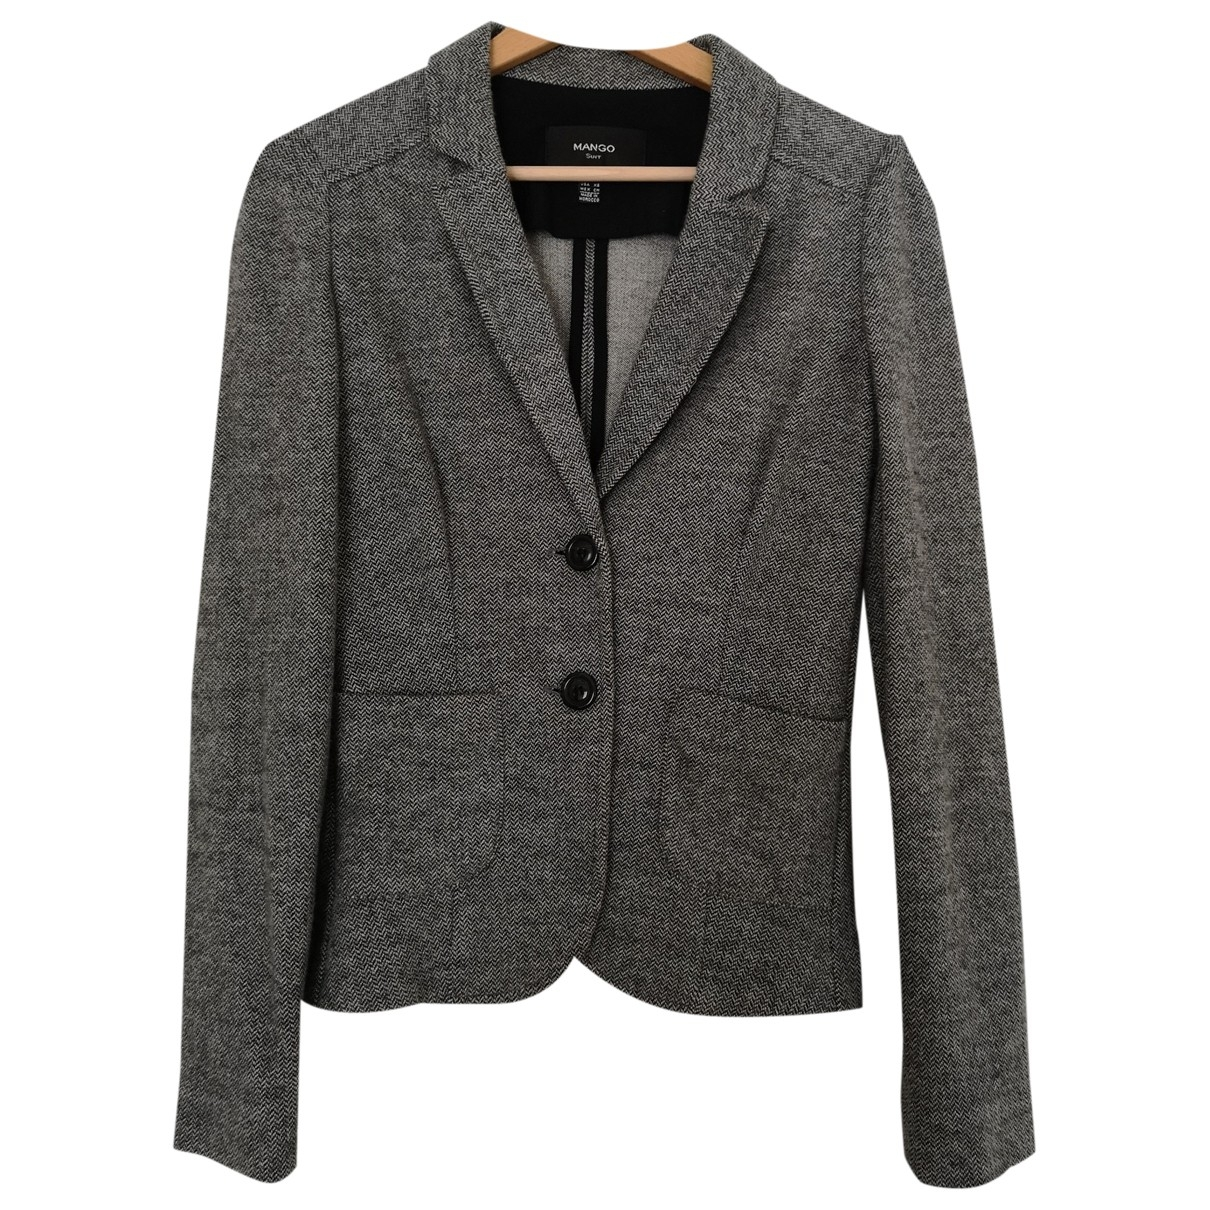 Mango \N Grey jacket for Women S International